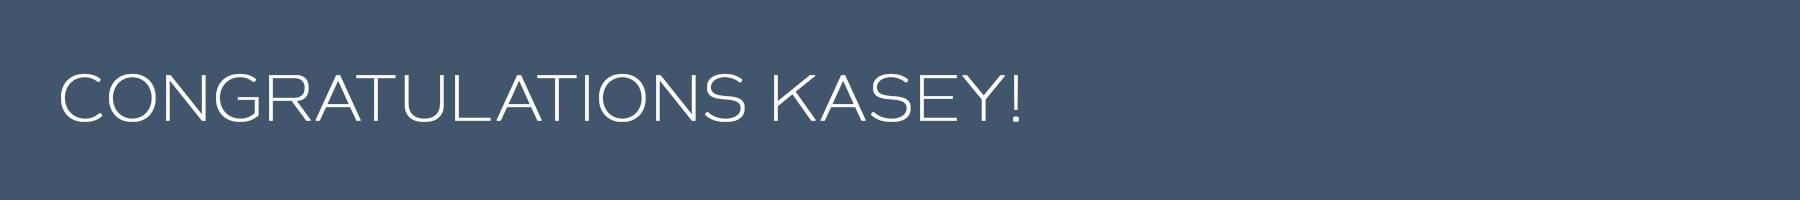 WEBSITE BANNER-Congratulations Kasey.png